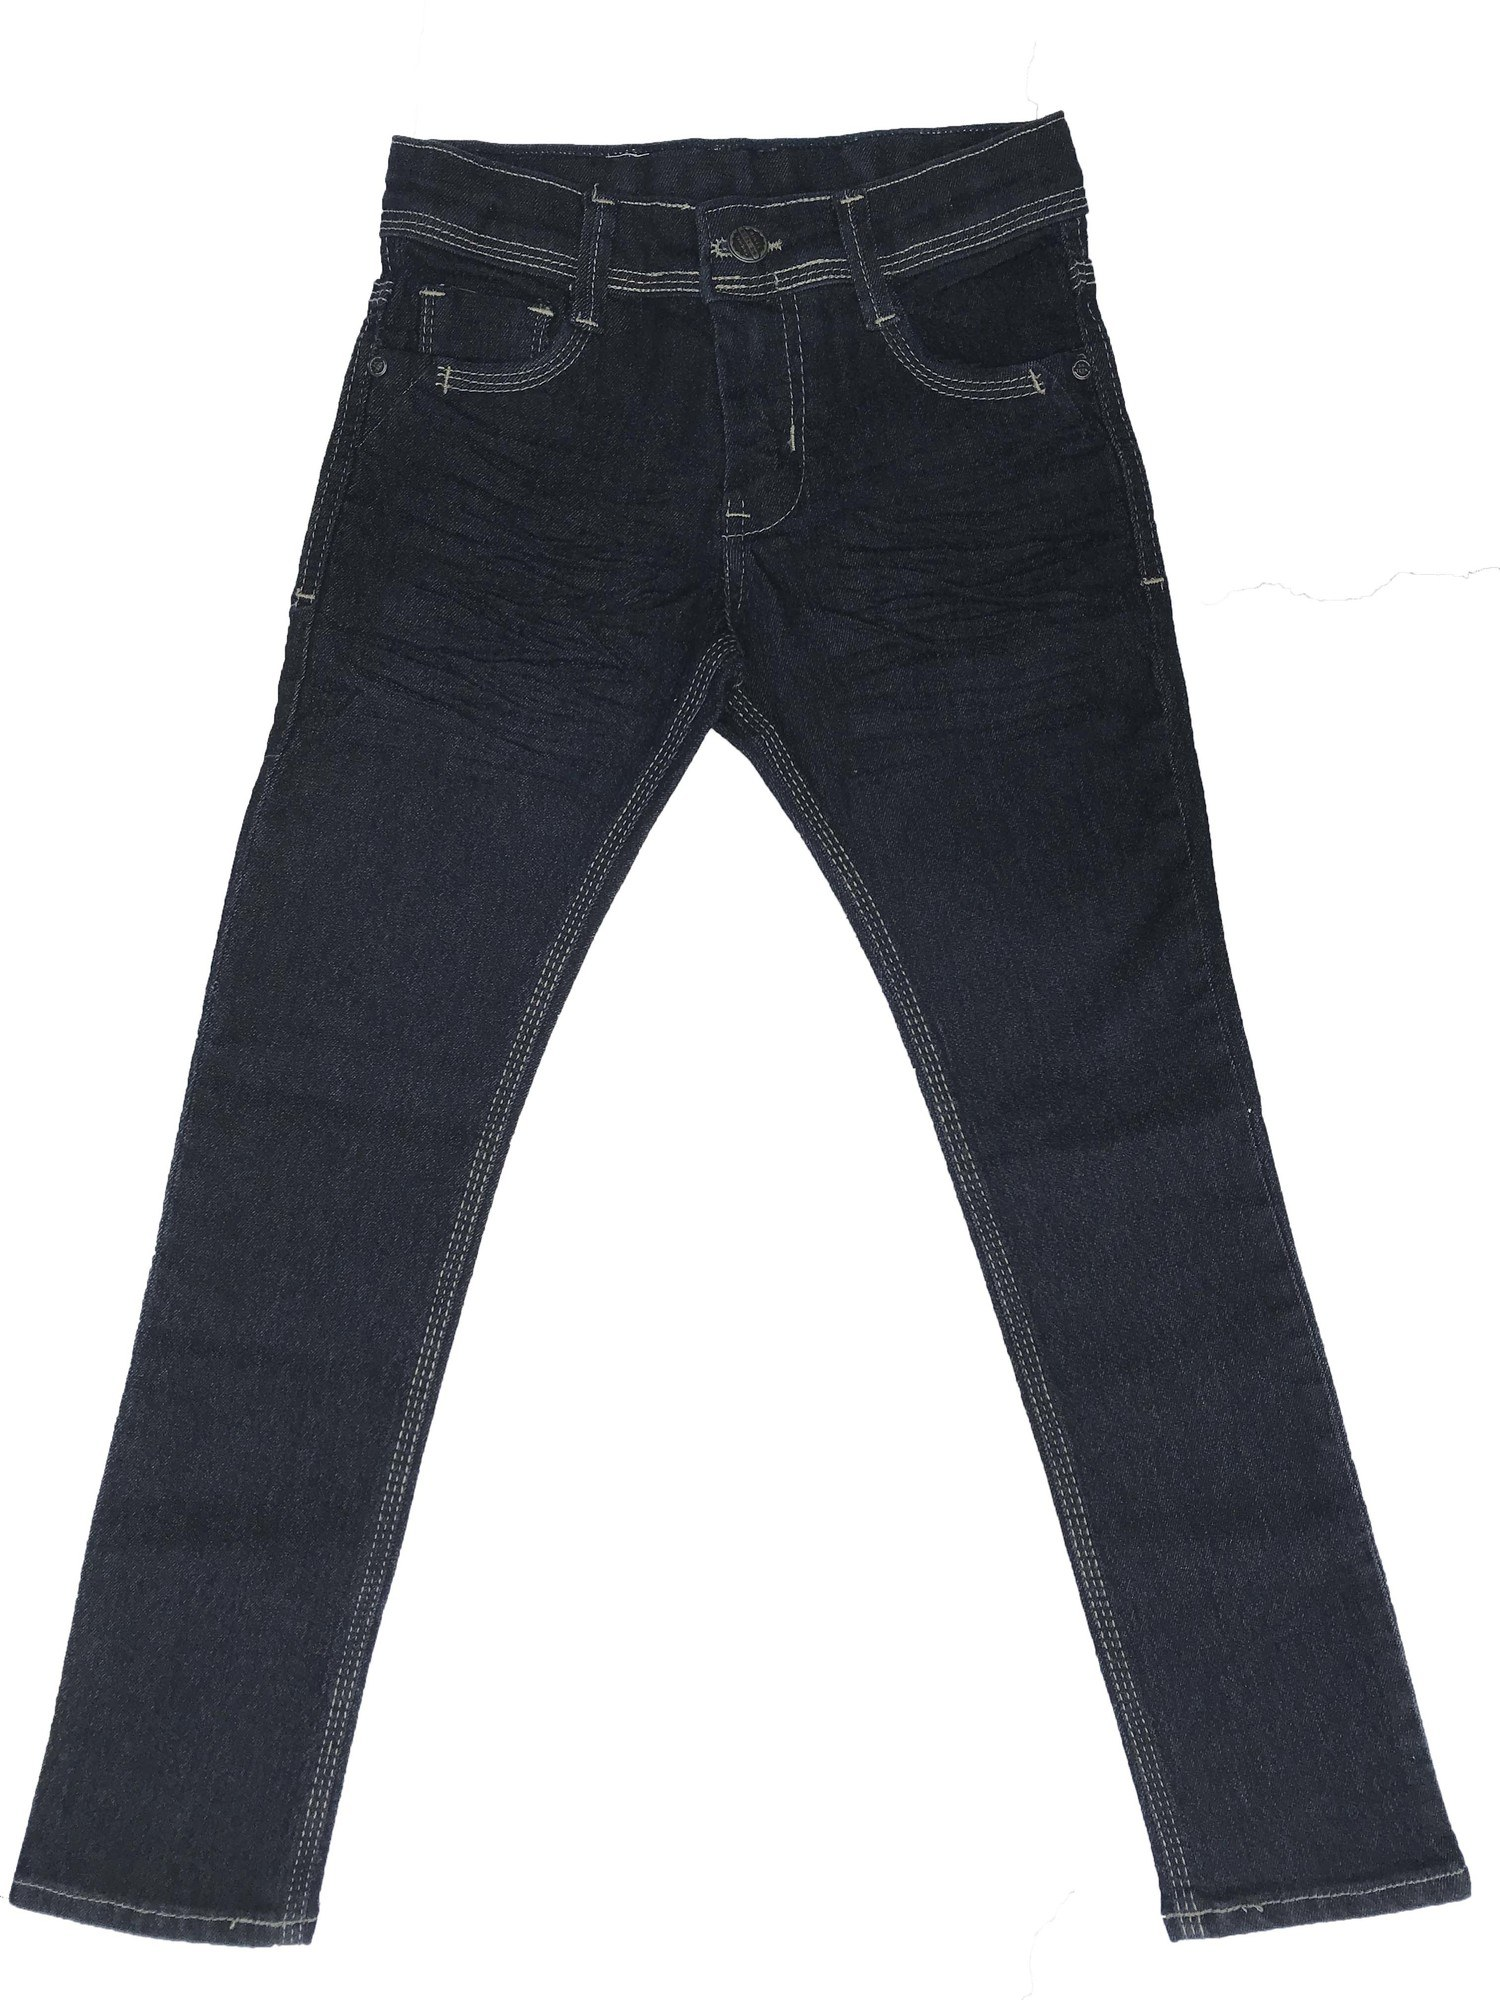 Calça Básica Azul Masculina Infantil [429]